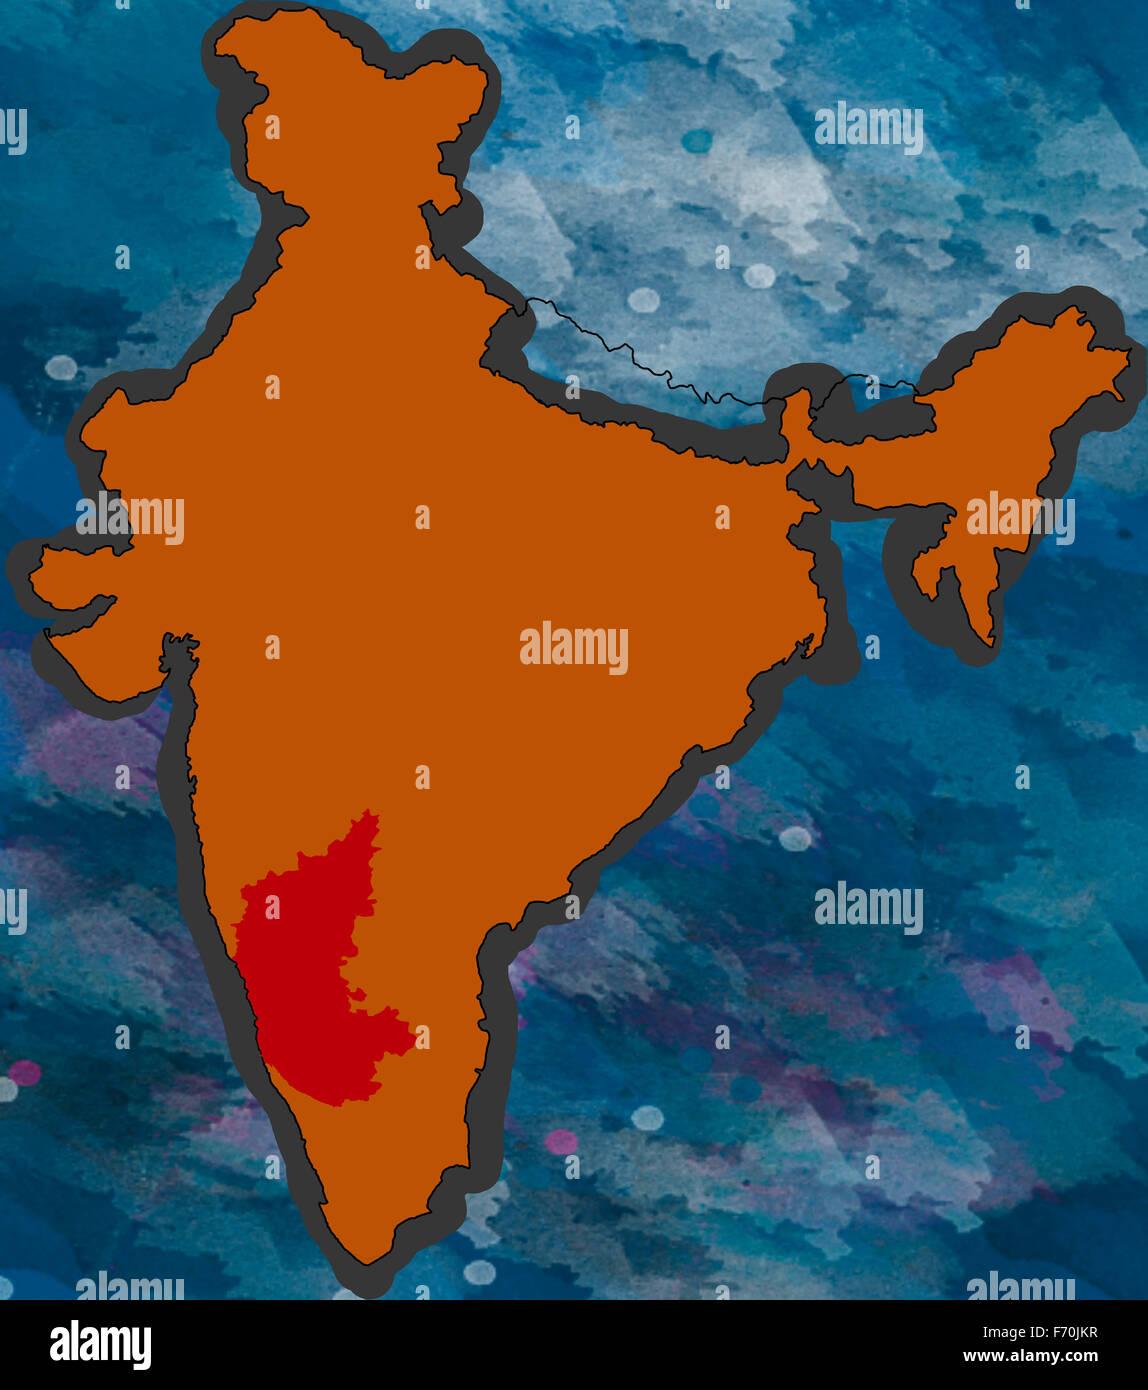 Illustration karnataka location map india asia Stock Photo